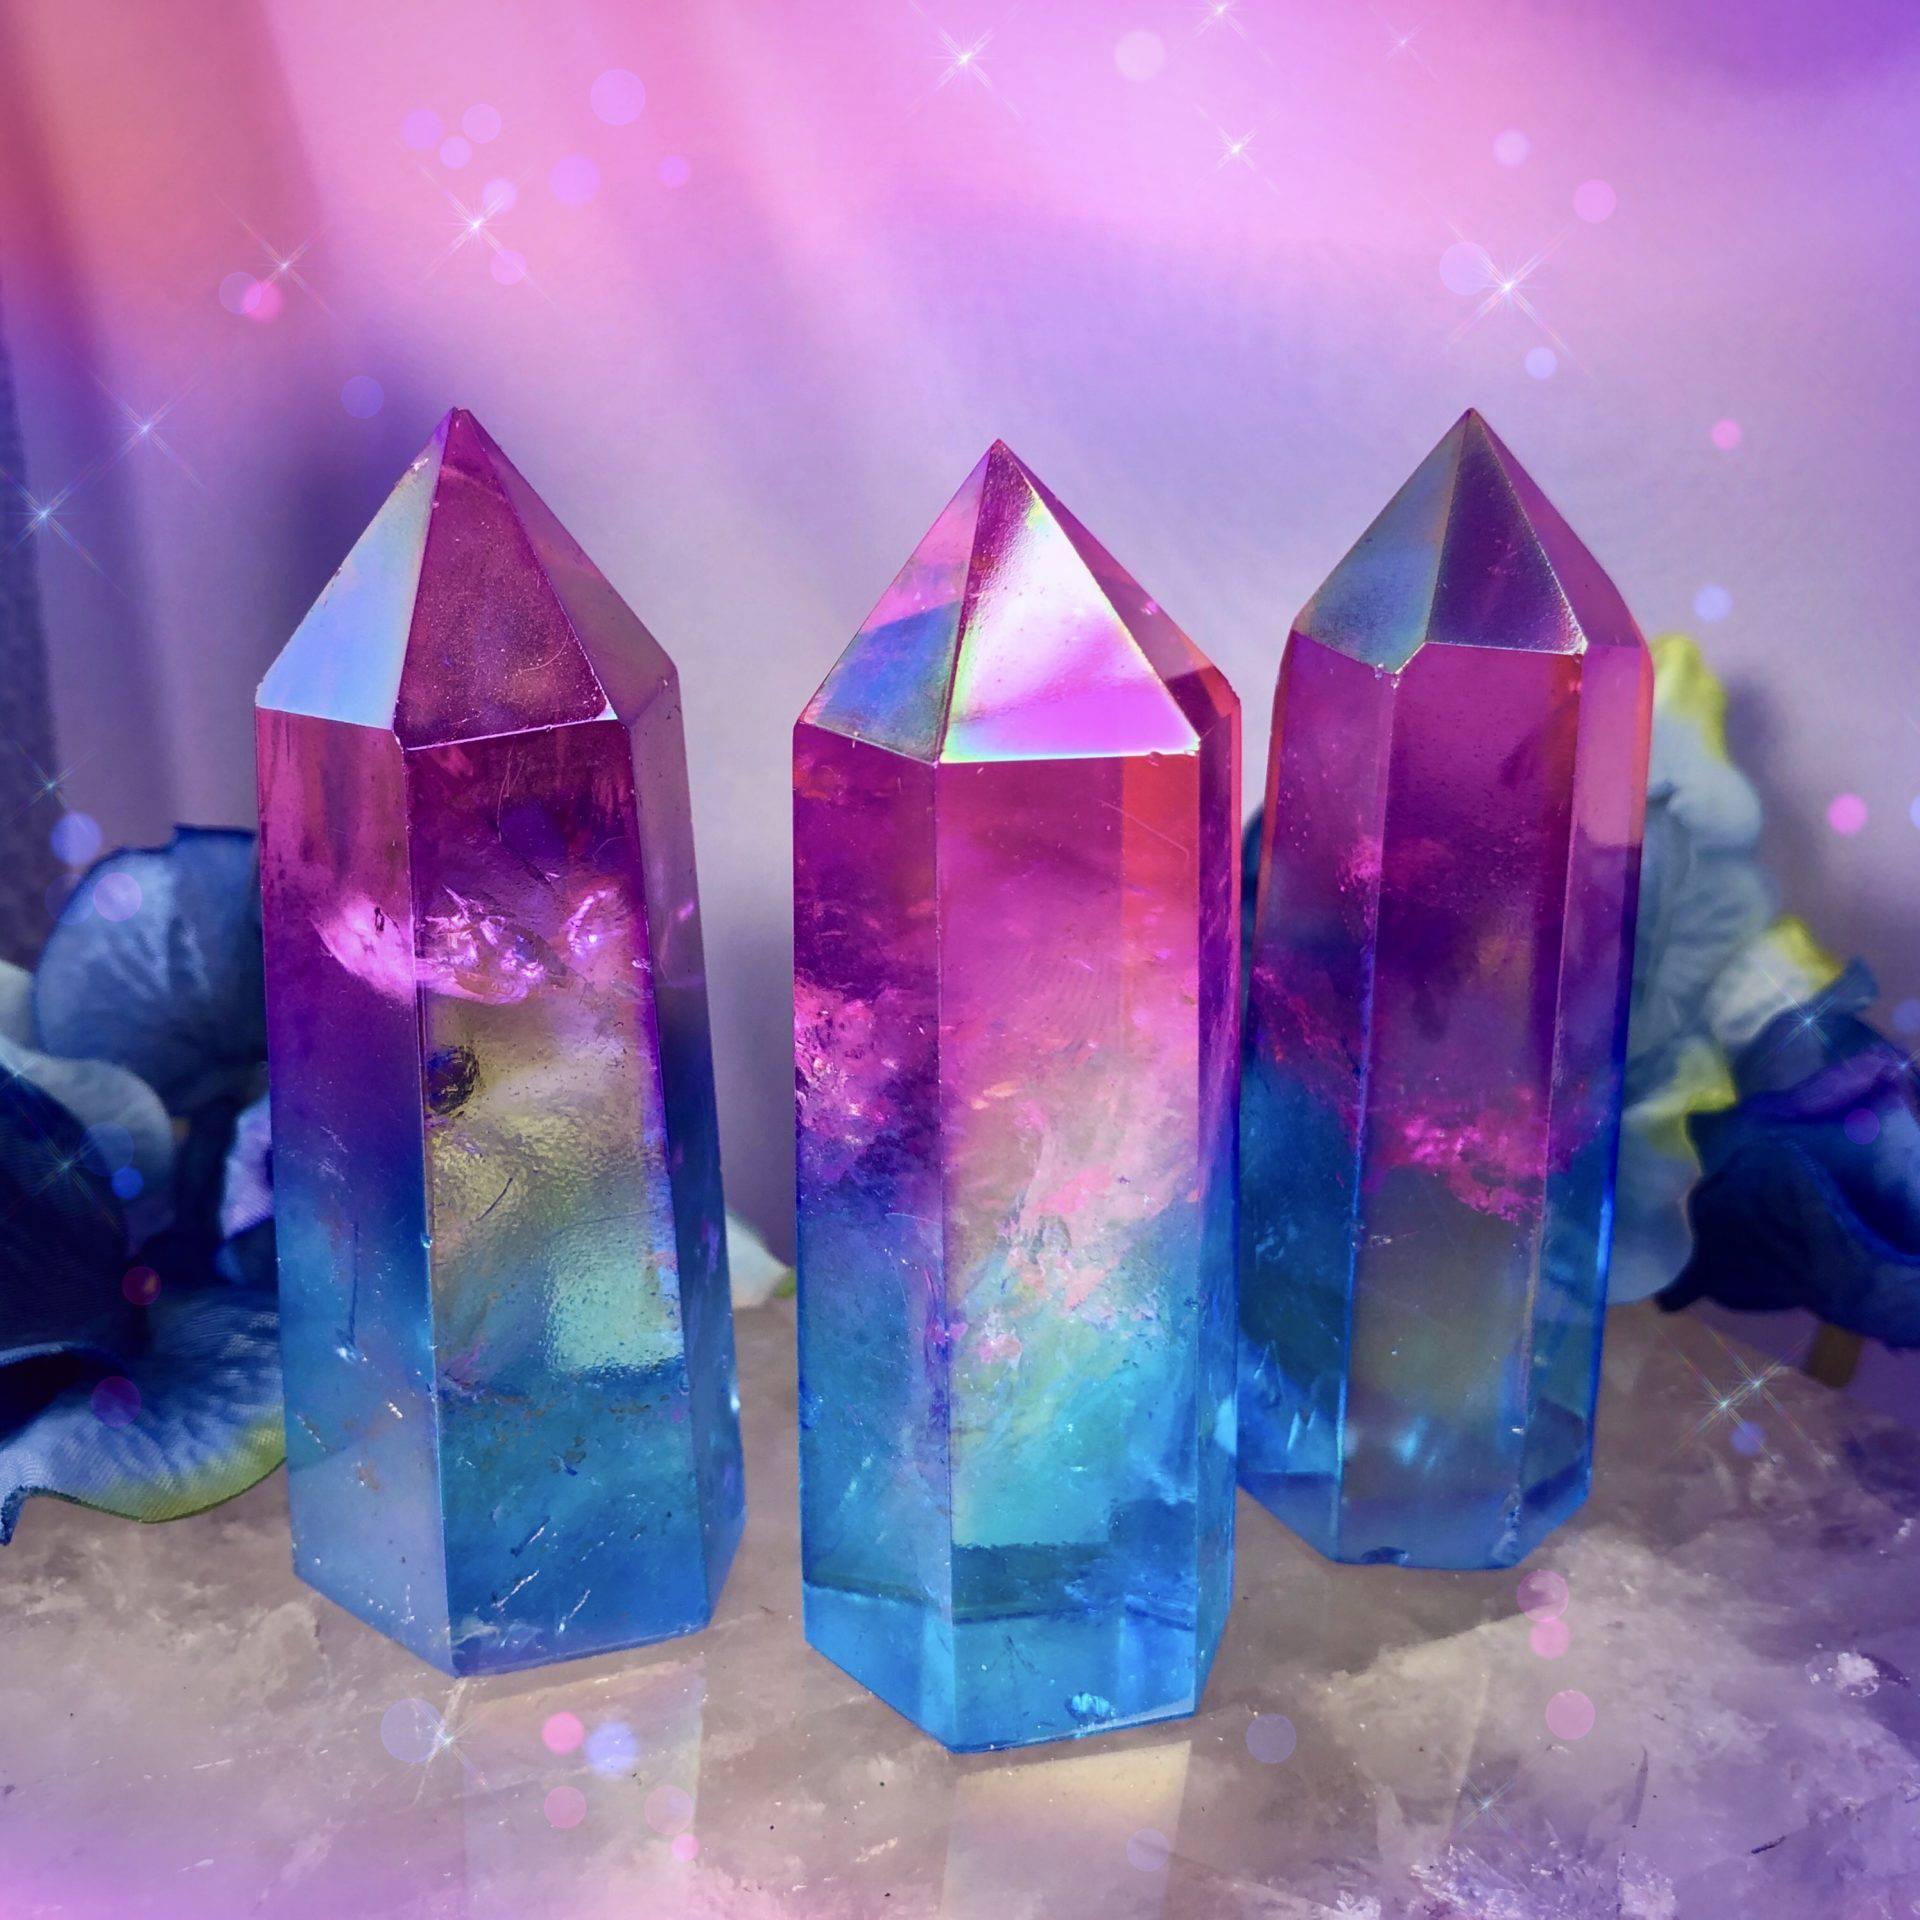 14mm Round Shape Crystal Quartz Rose Aura Quartz Blue Quartz GemMartUSA KP-10157 Aura Quartz Doublet Quartz